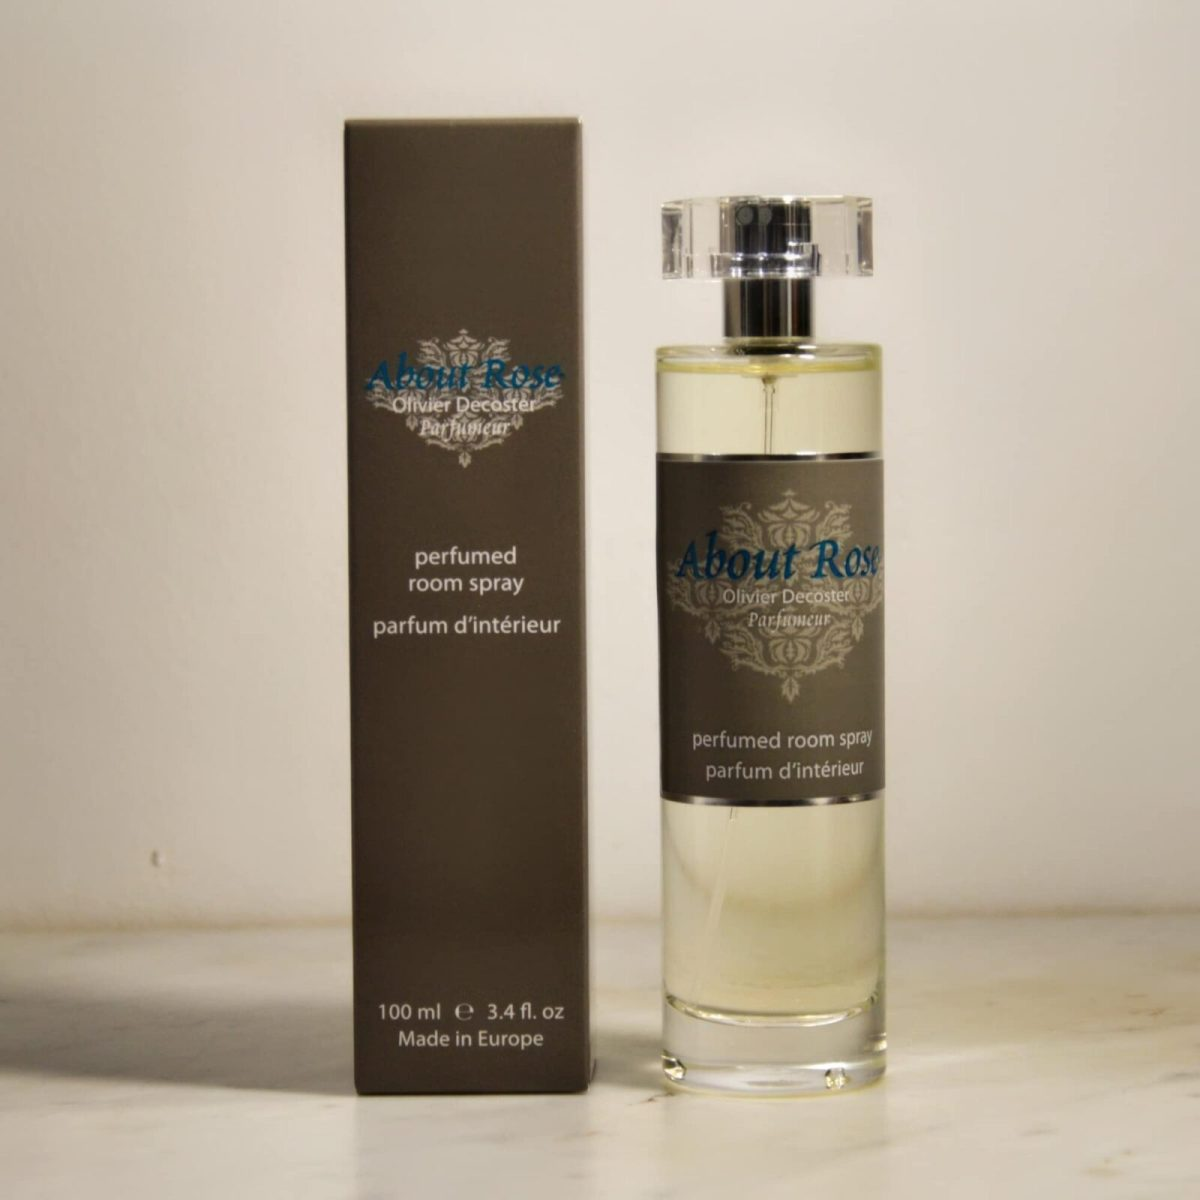 Luxury About Rose Imperial Room Fragrance- Elegant Perfum - Indoor Spray